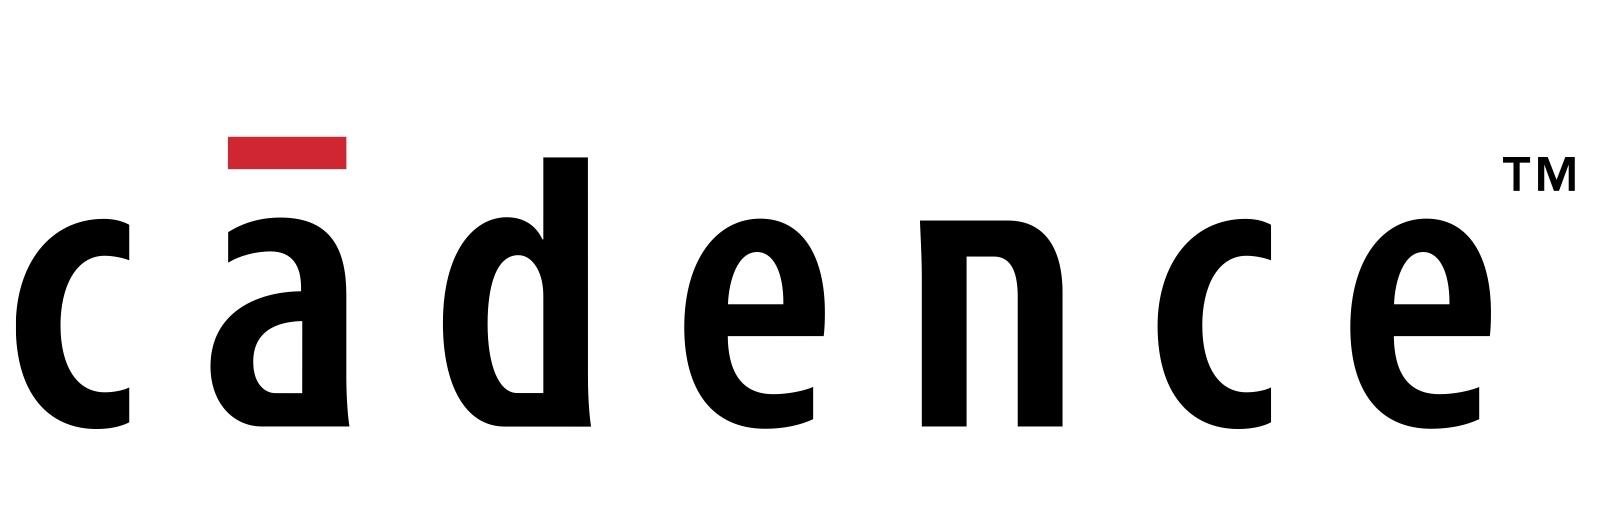 cadence-design-syste-logo.jpg